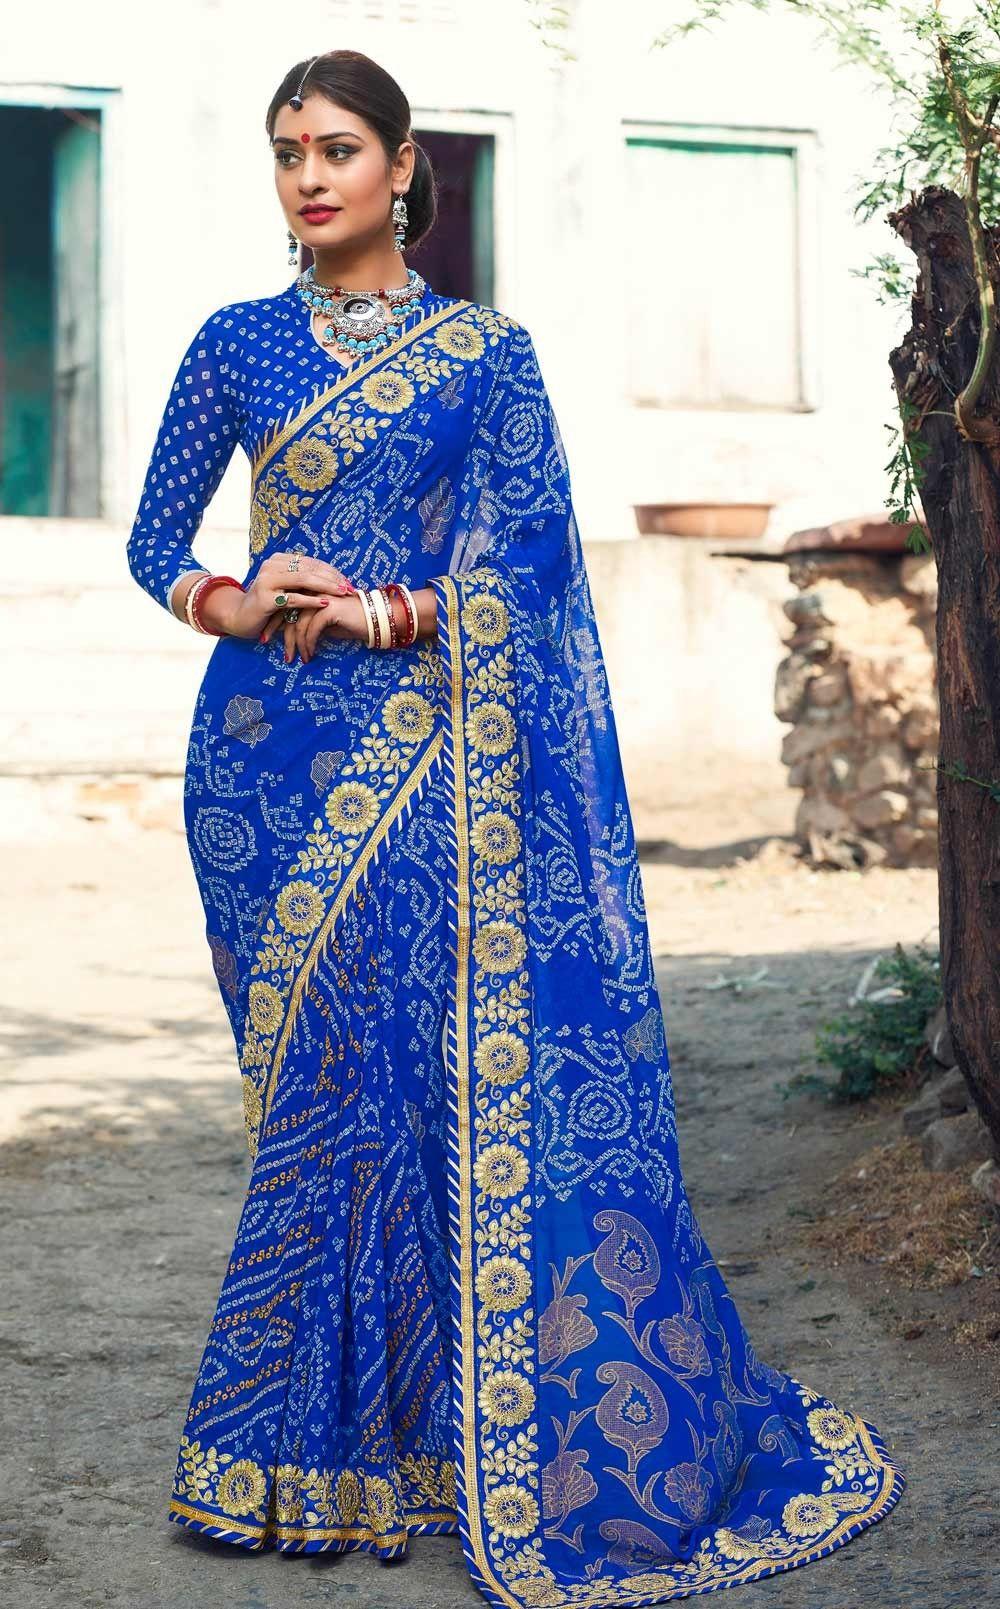 0f825edf7c Designer Blue Georgette Bandhani Print Saree with heavy zari work lace  border